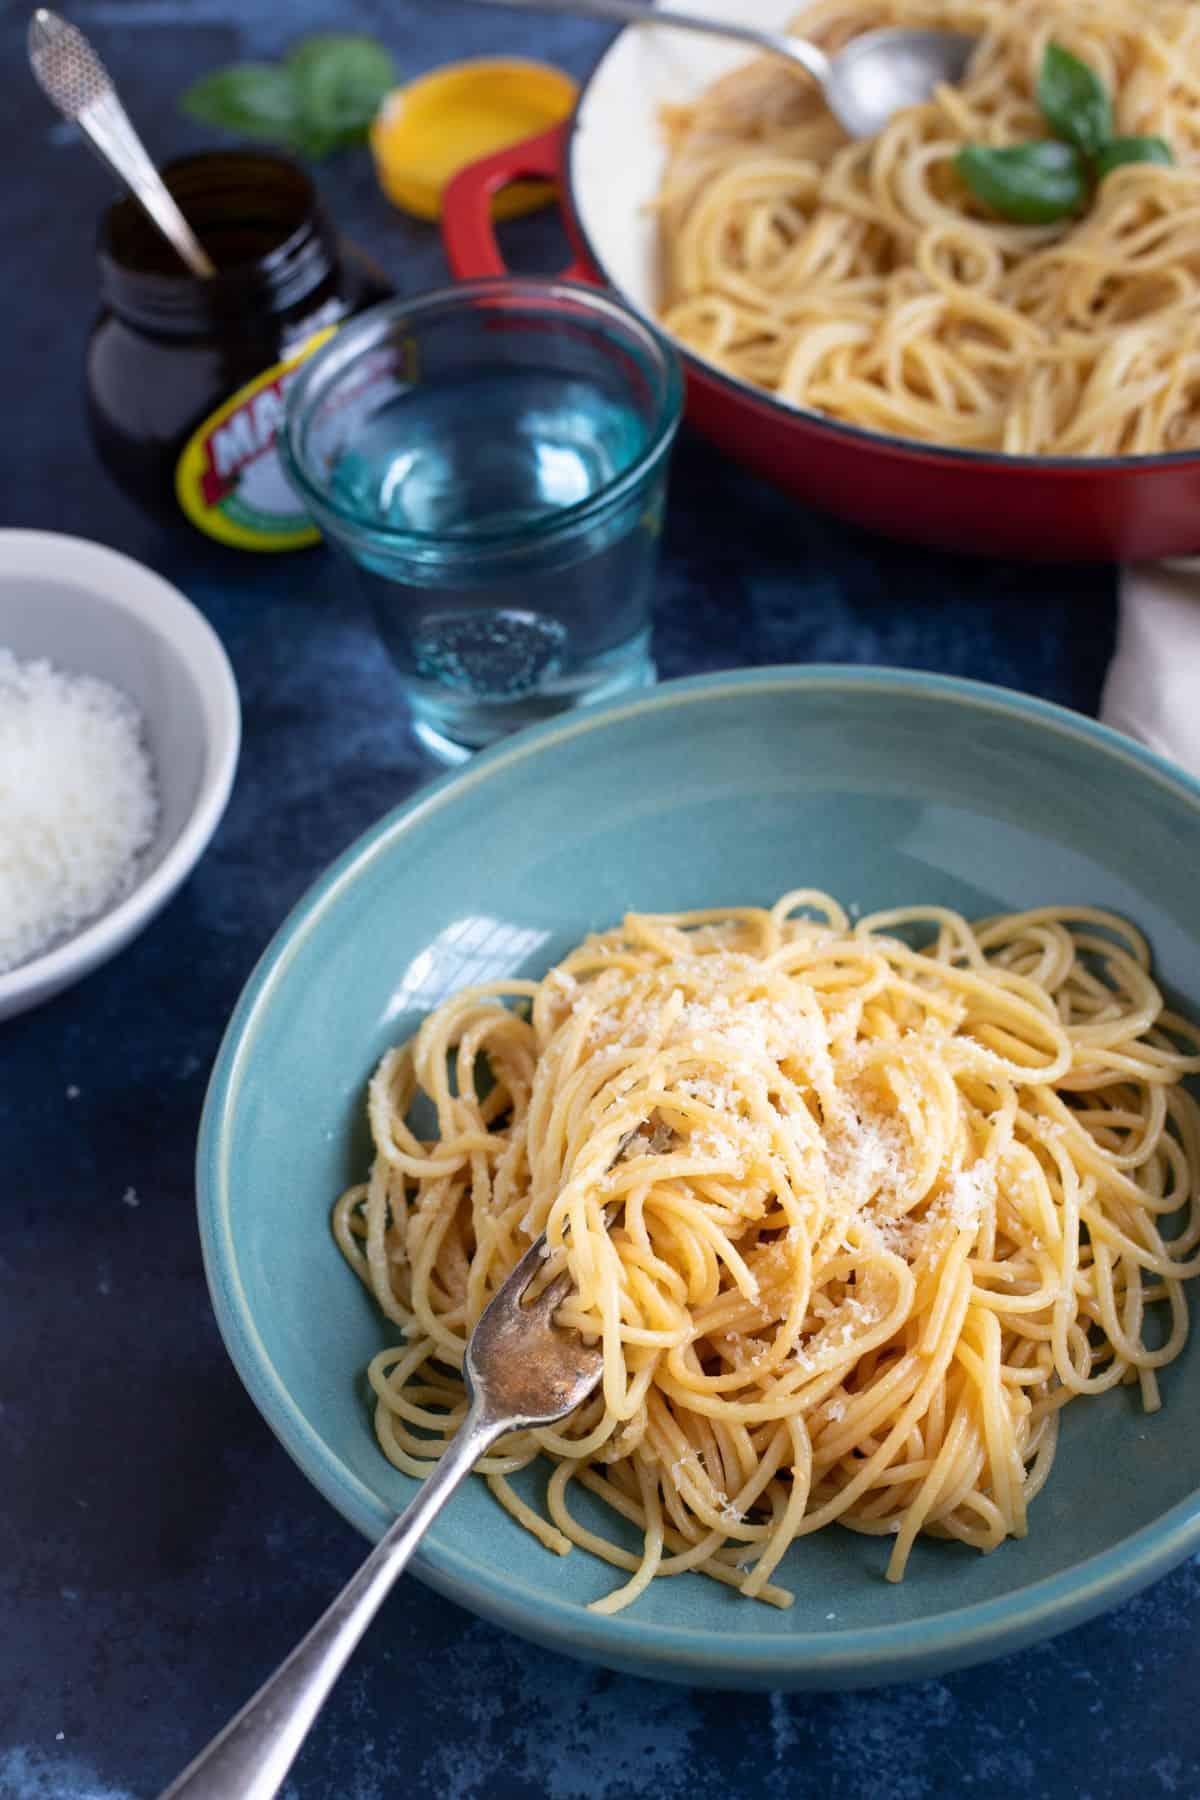 A bowl of marmite pasta.